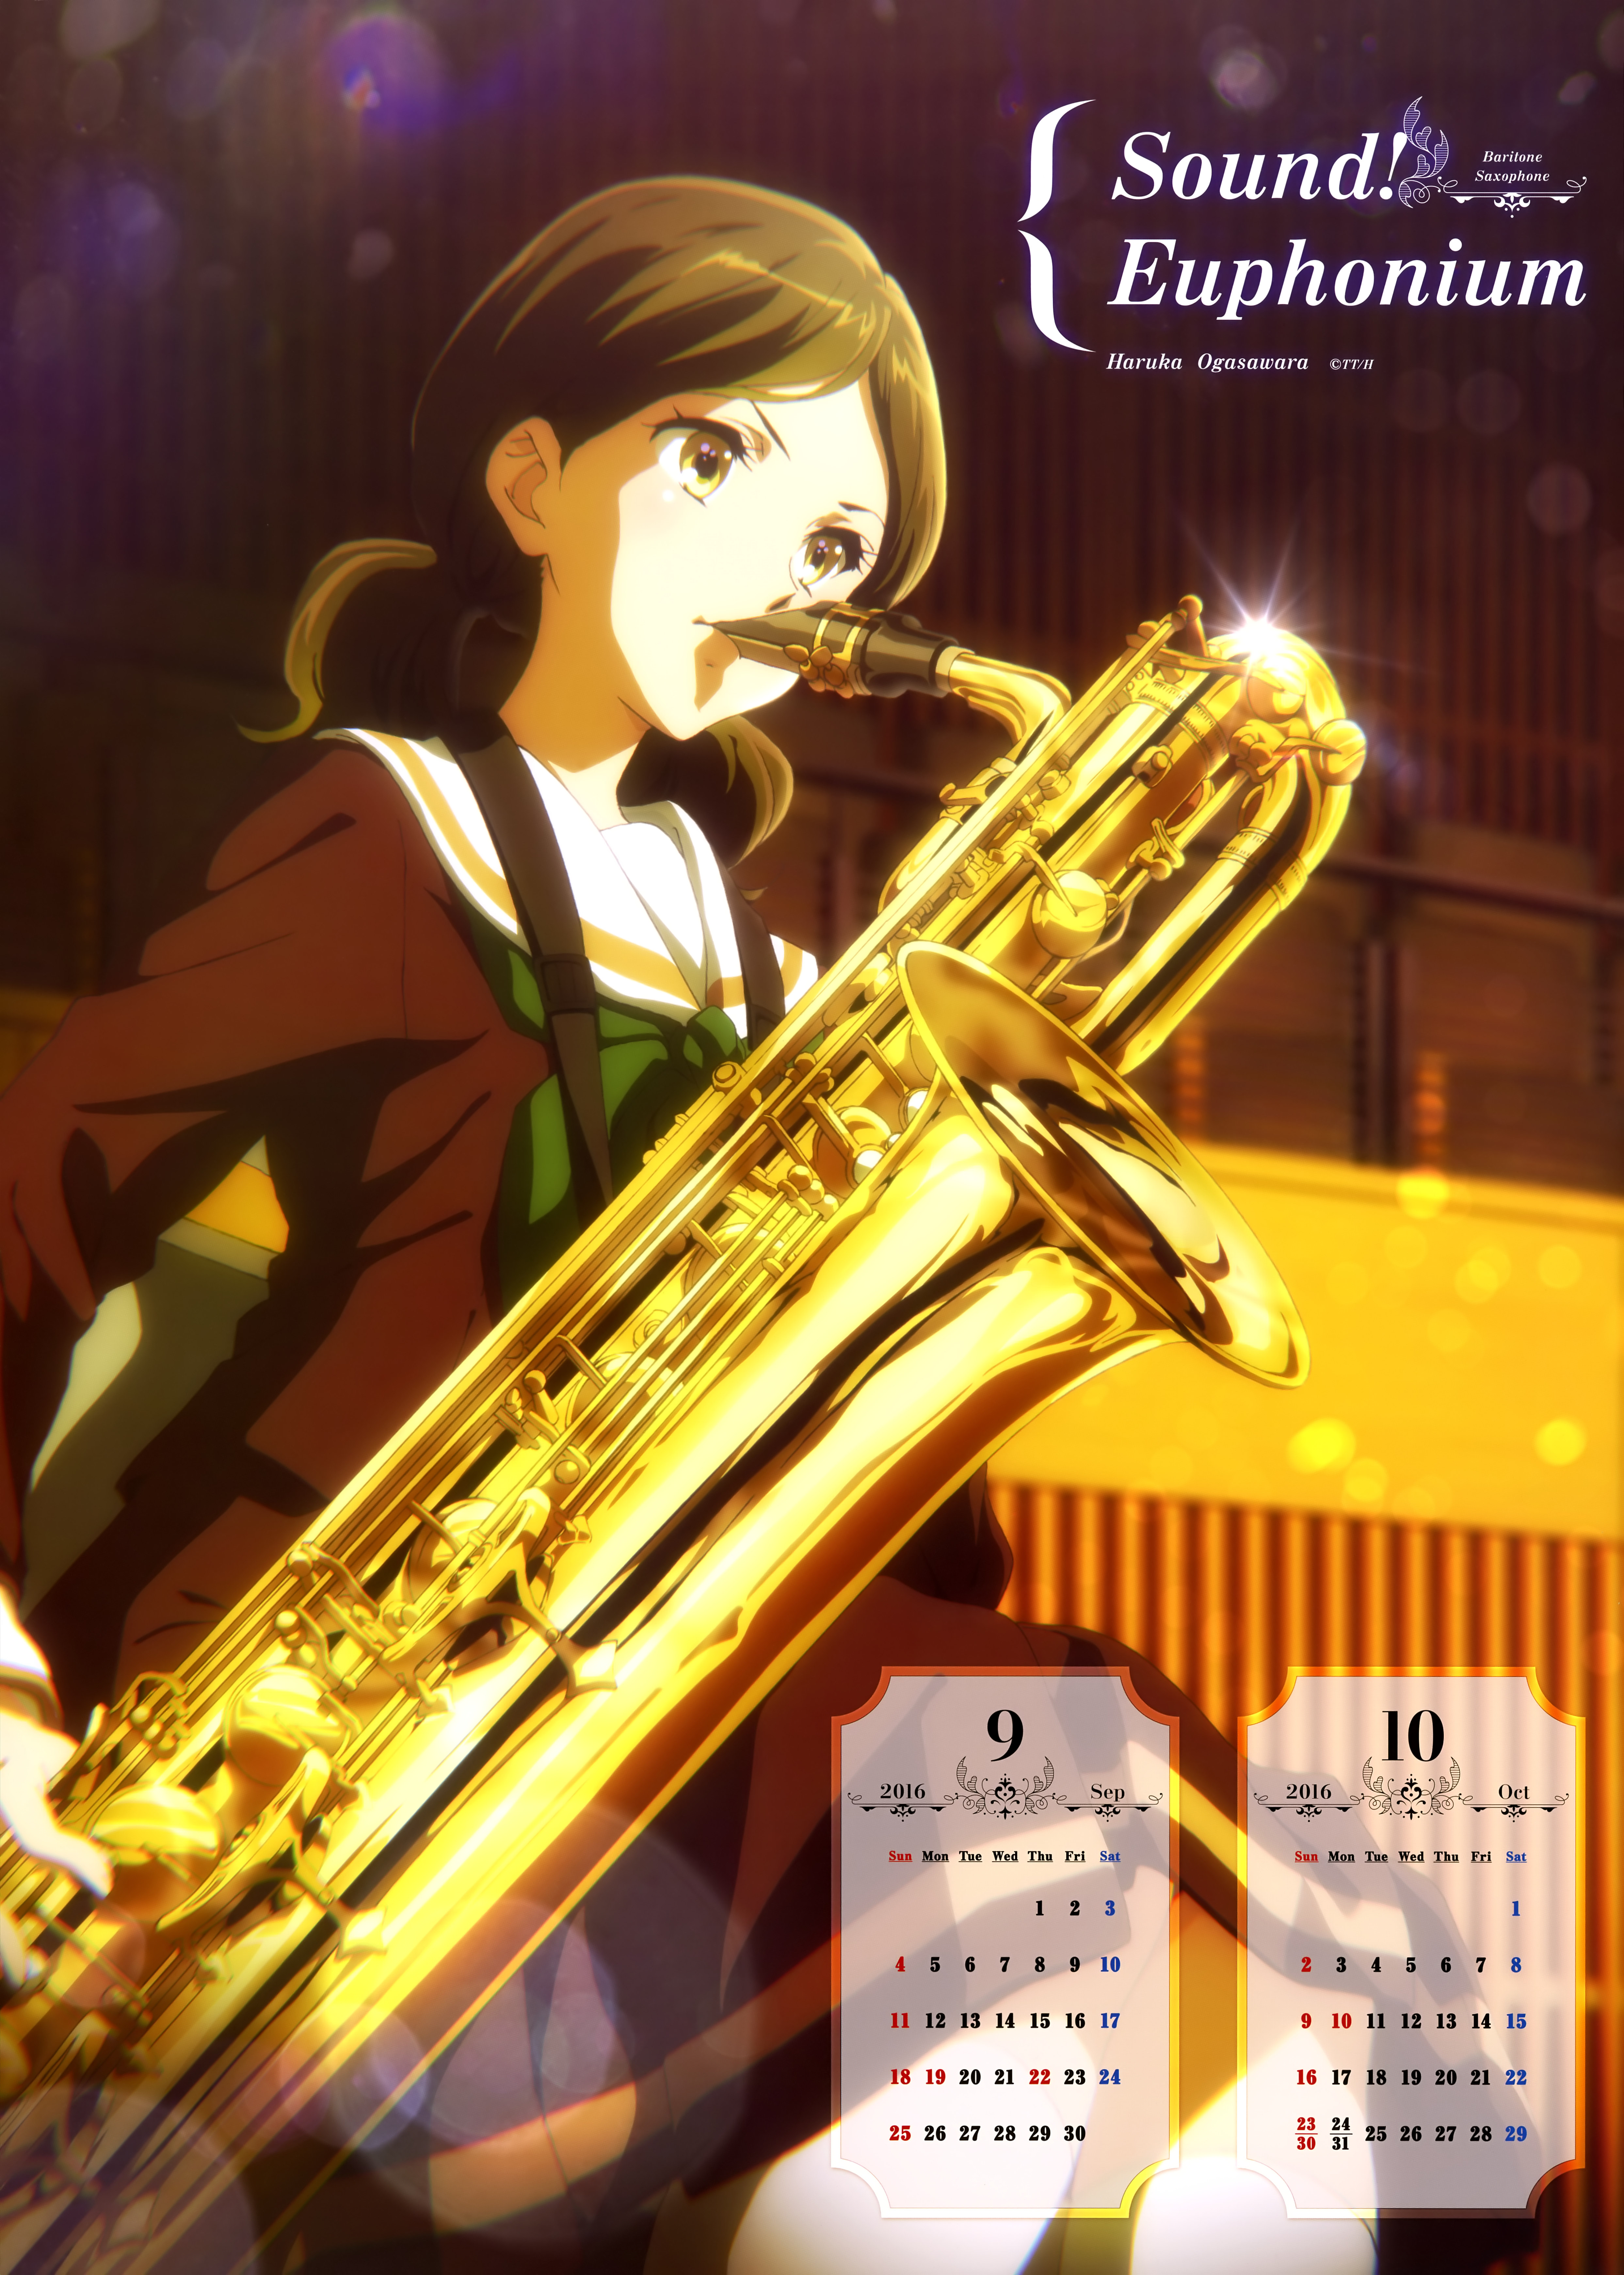 Hibike! Euphonium Anime calendar 2016 0005